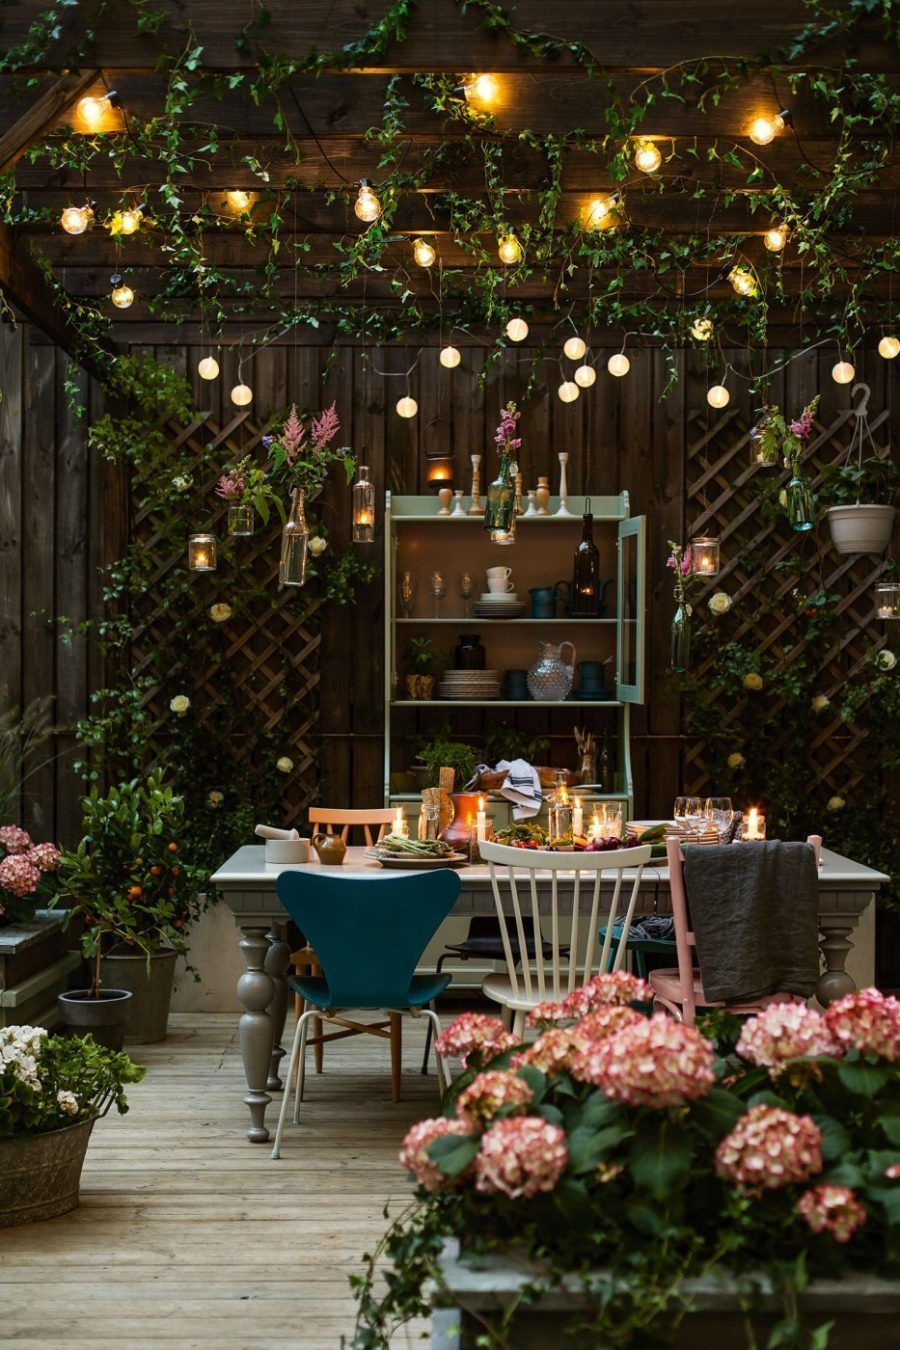 Awesome 17+ Backyard Lighting Ideas : Best Lighting Ideas For Wonderful Outdoor